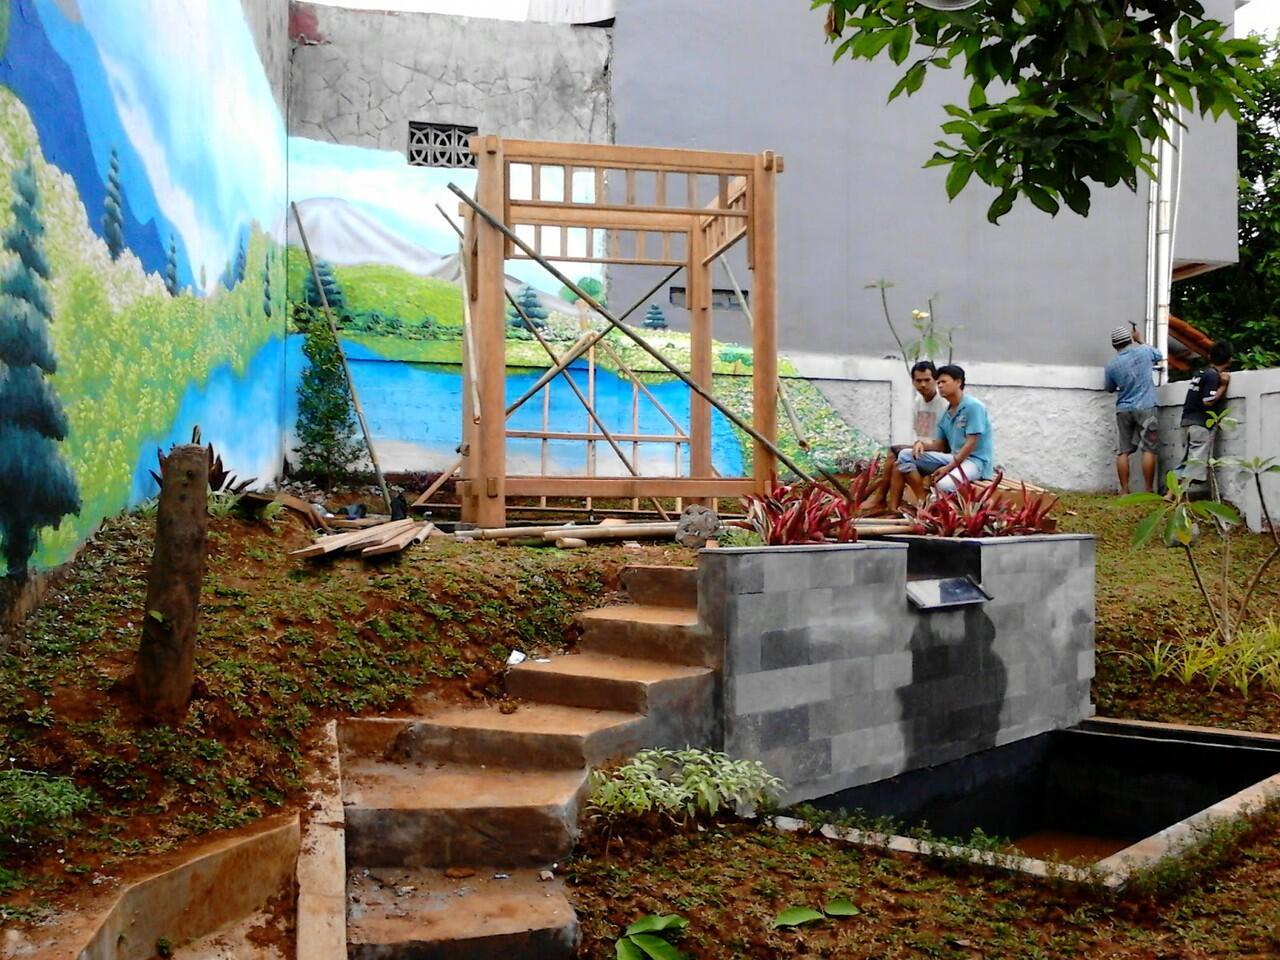 Terjual Tukang Taman Tropis Taman Bali Taman Jepang Kolam Minimalis